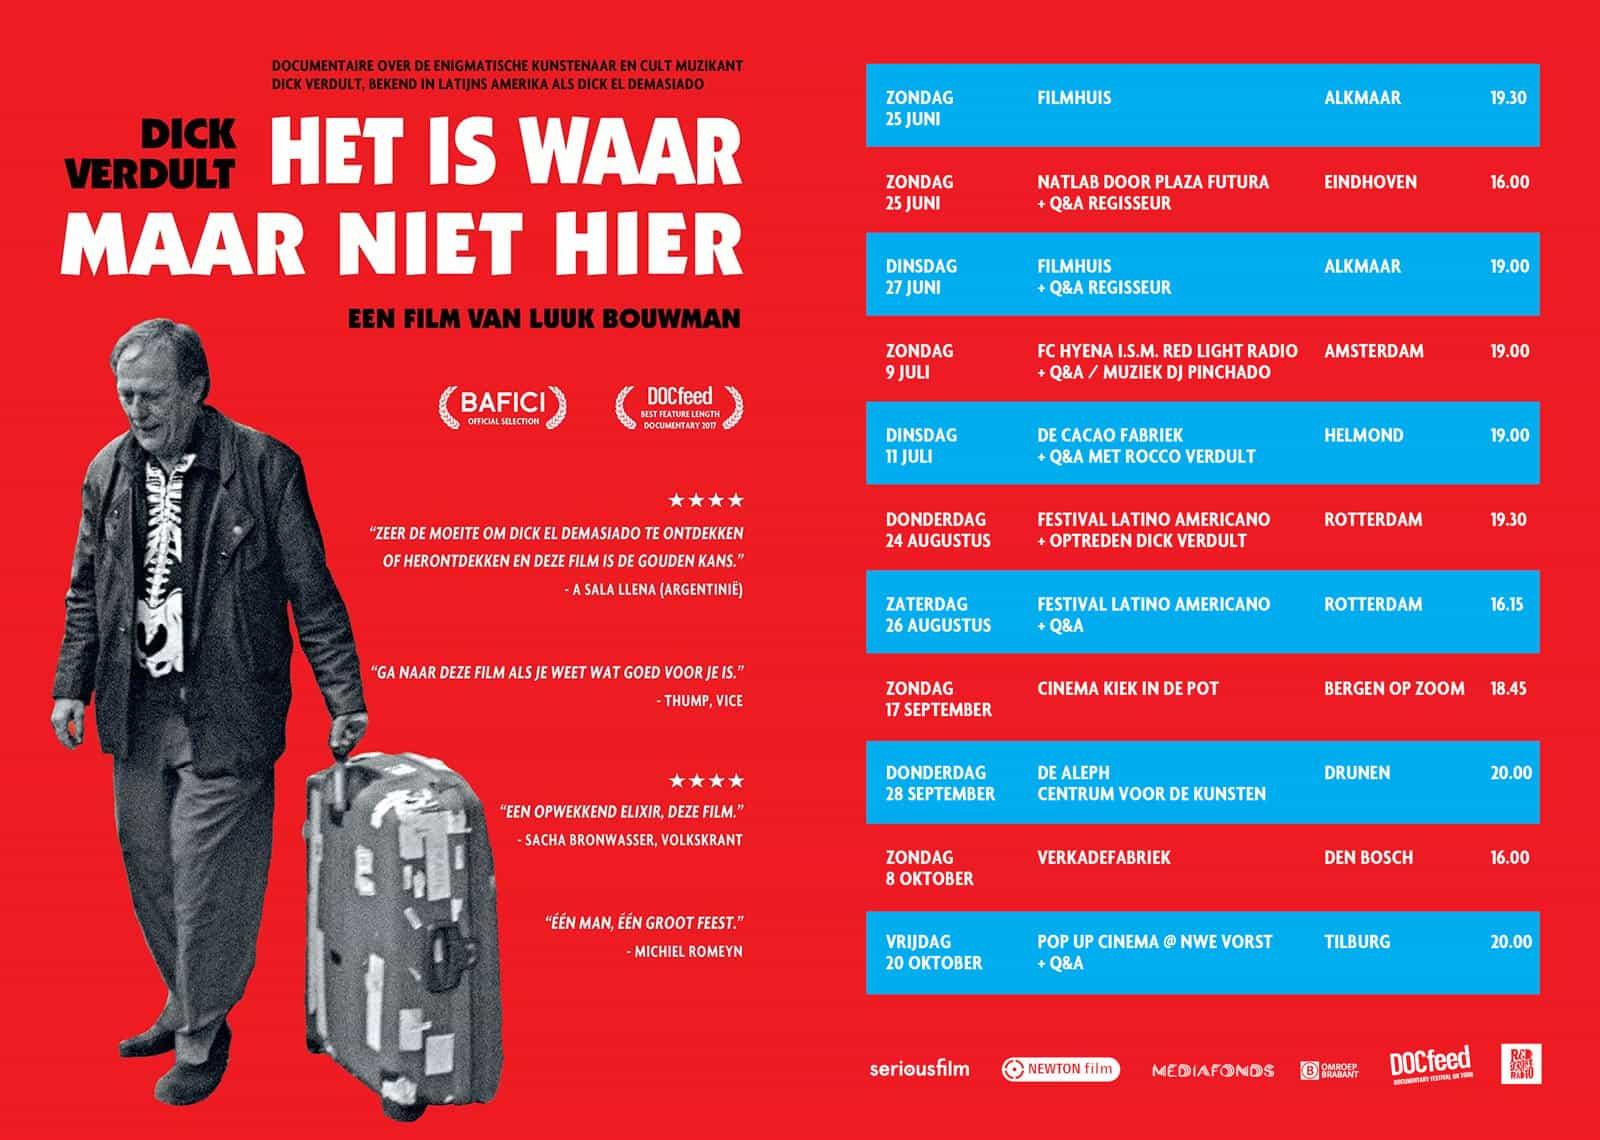 Vertoningen in Nederland